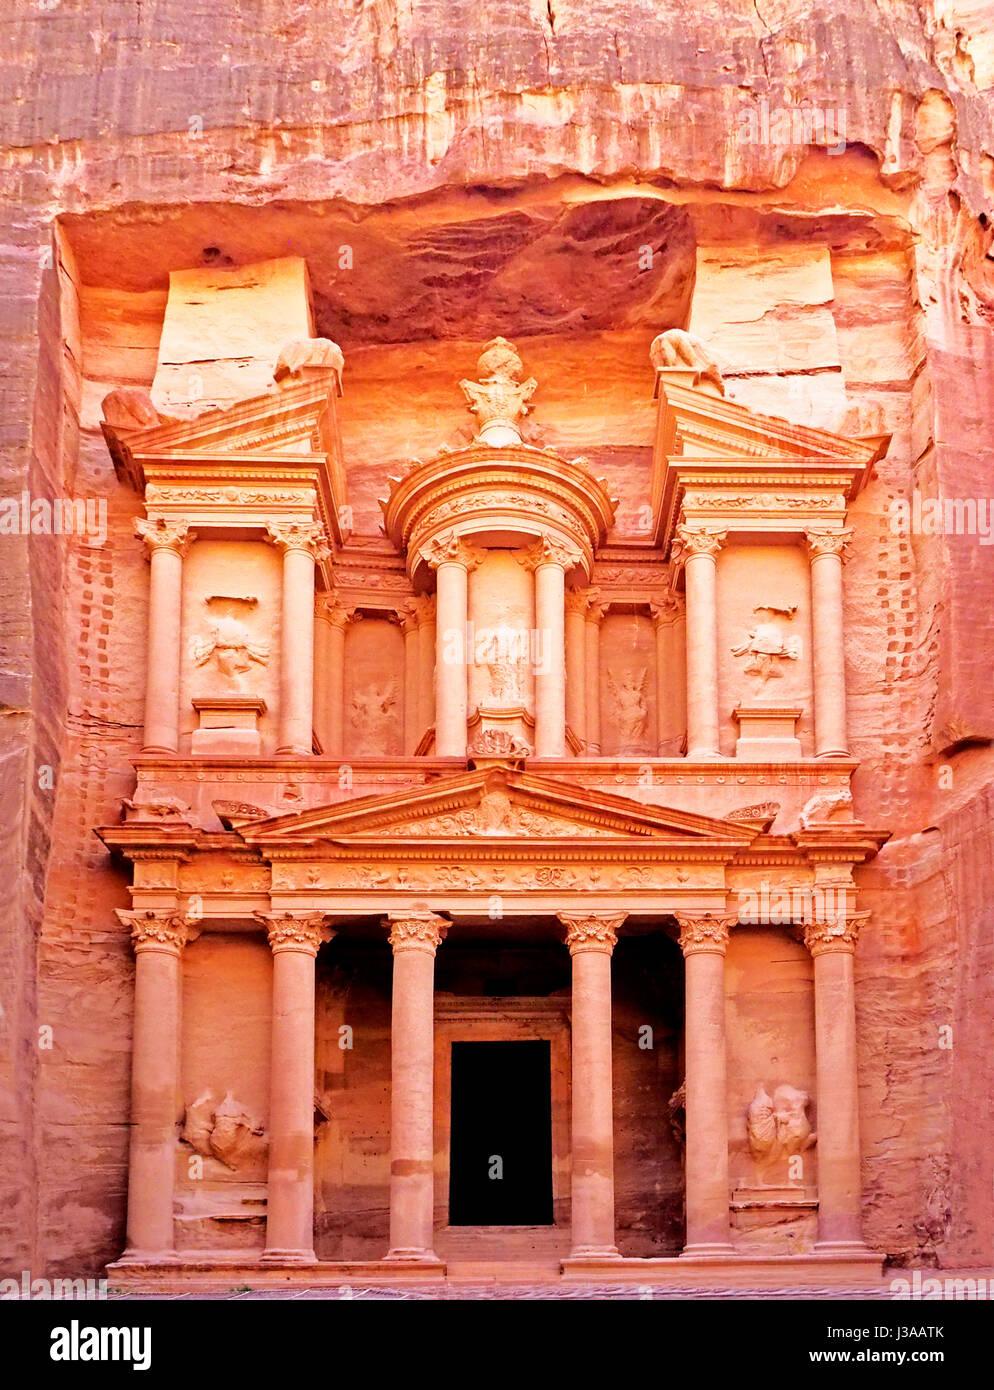 Facade of The Treasury in Petra. - Stock Image